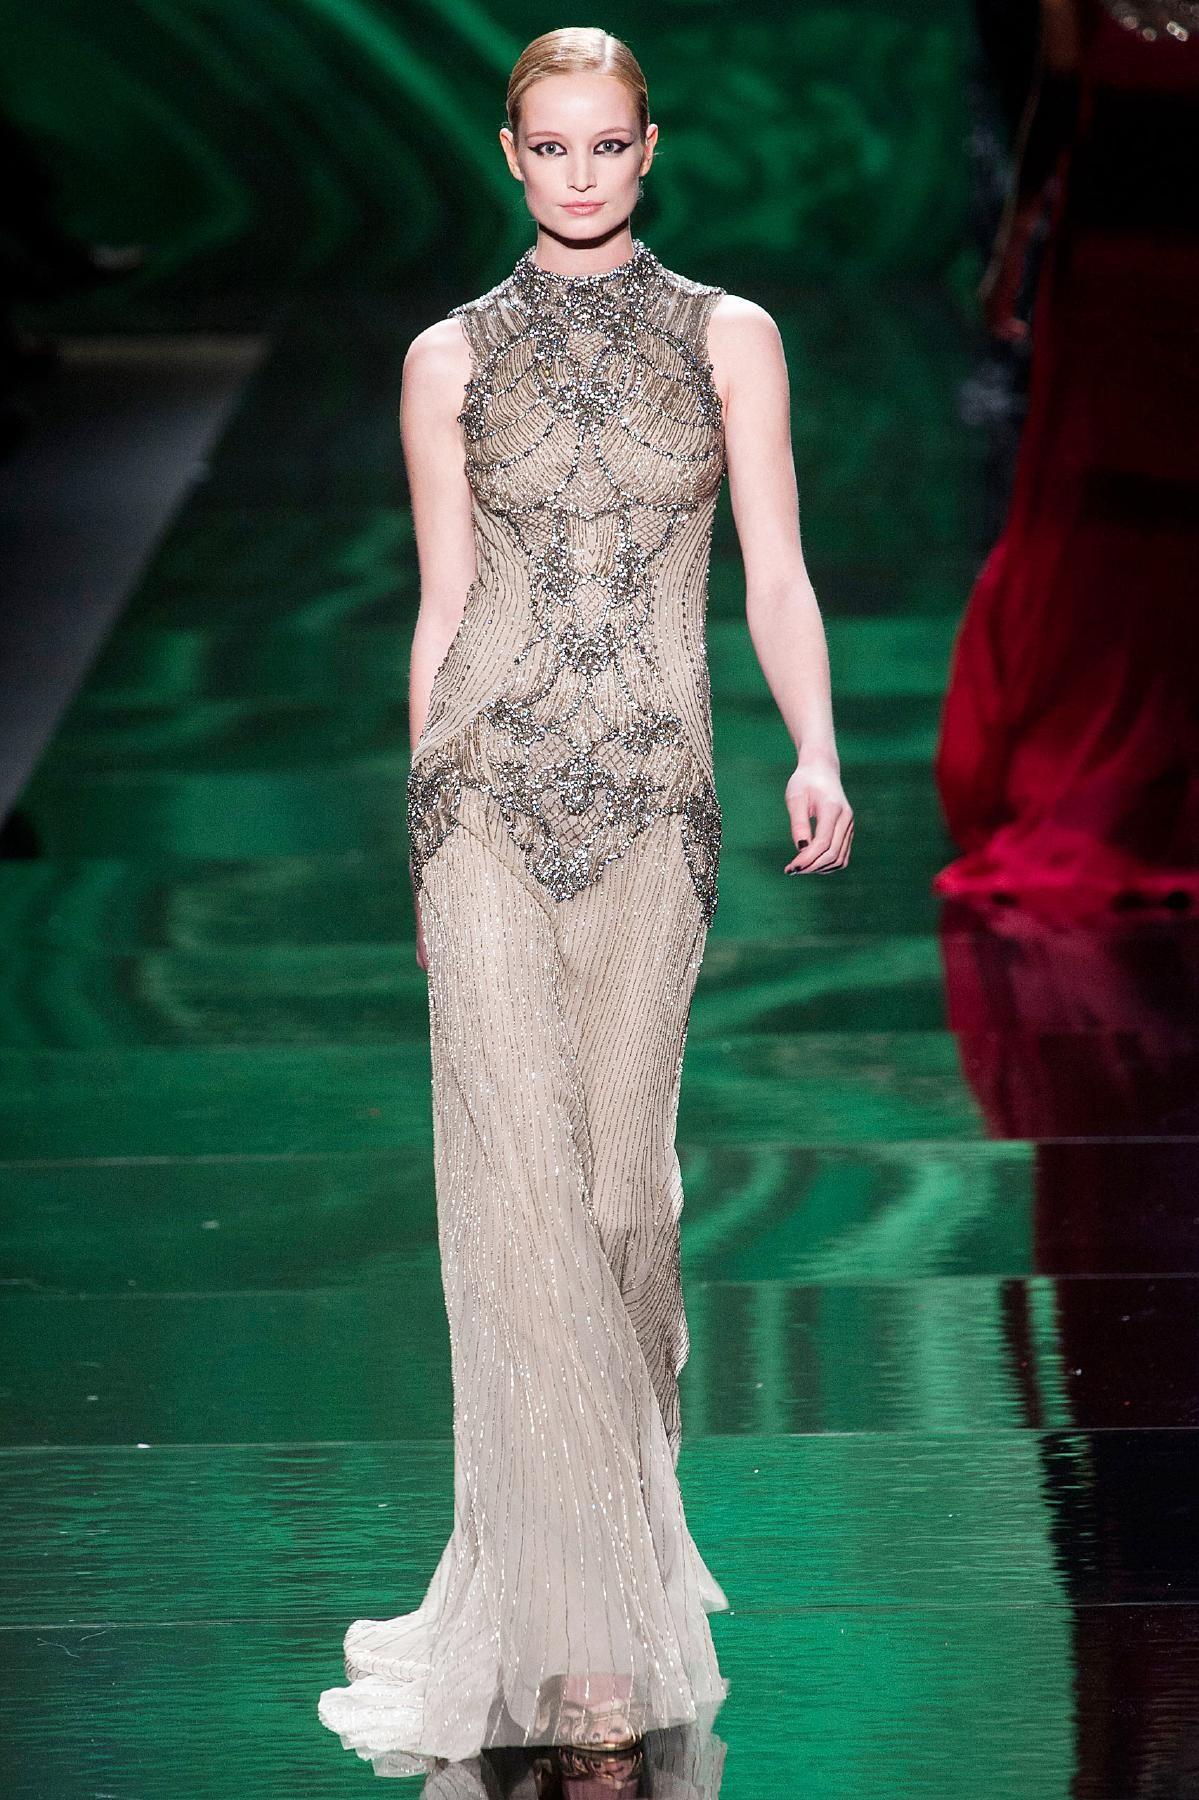 Monique lhuillier fall 2013 rtw fashion show in 2020